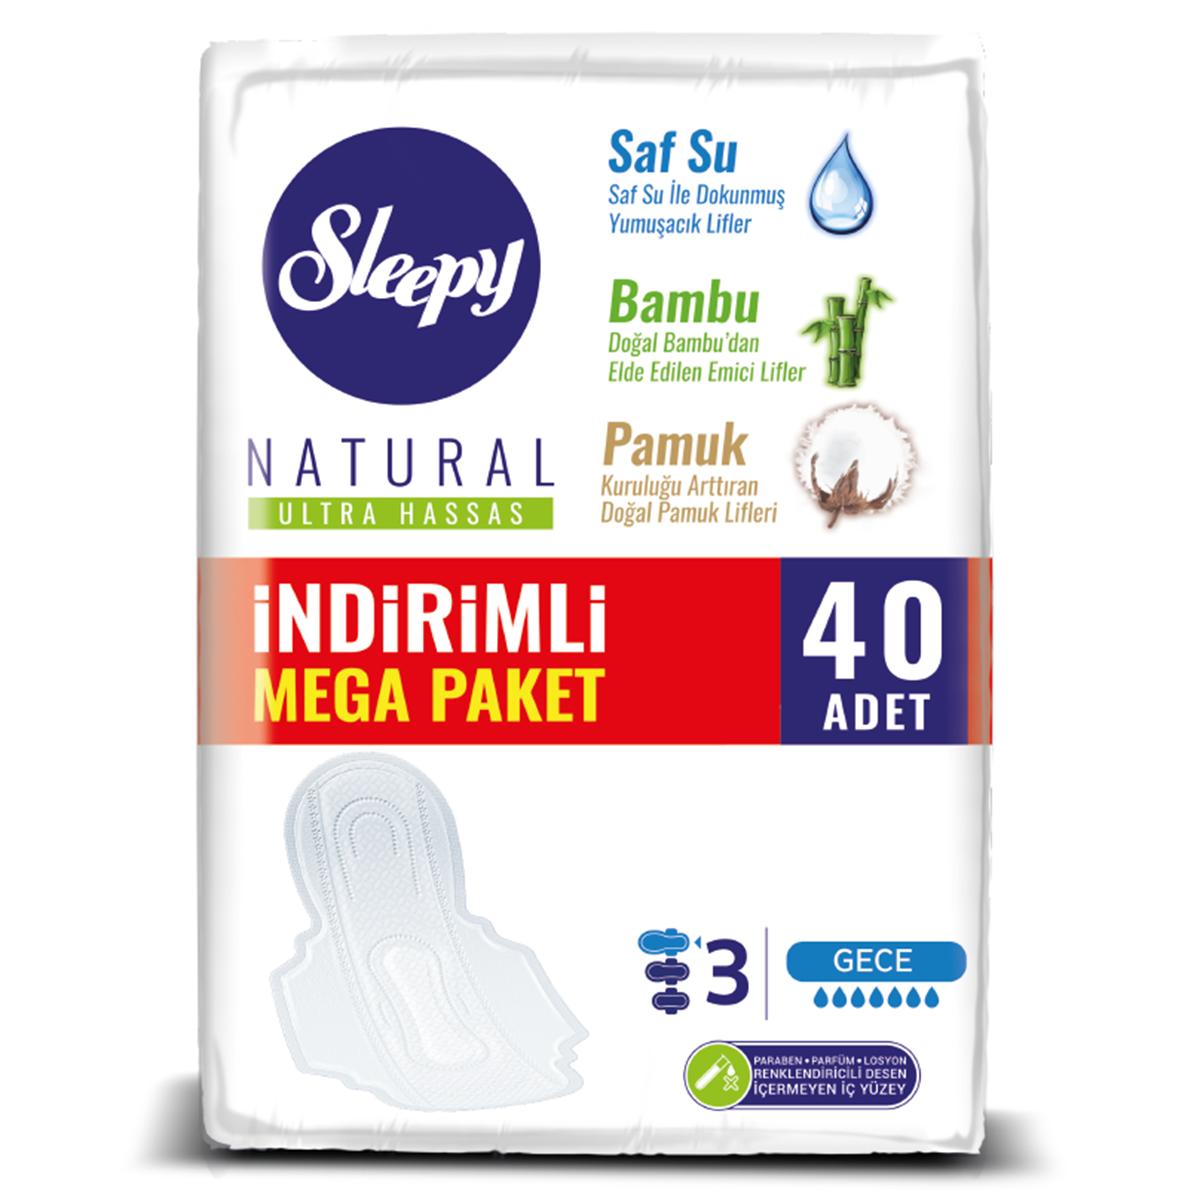 Sleepy Natural Ultra Hassas GECE (40 Ped) MEGA PAKET